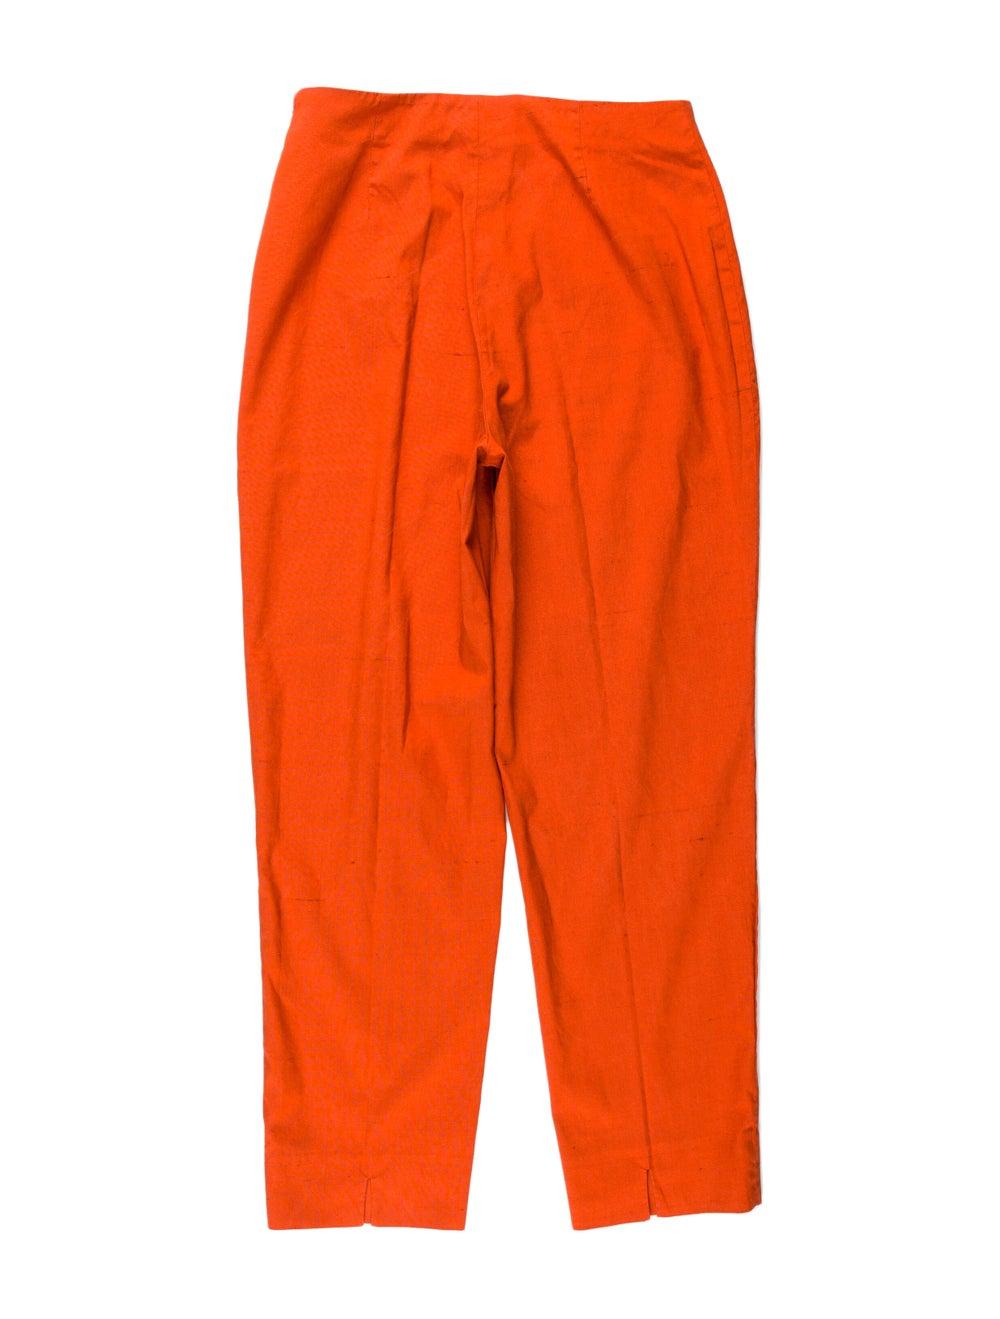 Piazza Sempione Silk Straight Leg Pants Orange - image 2